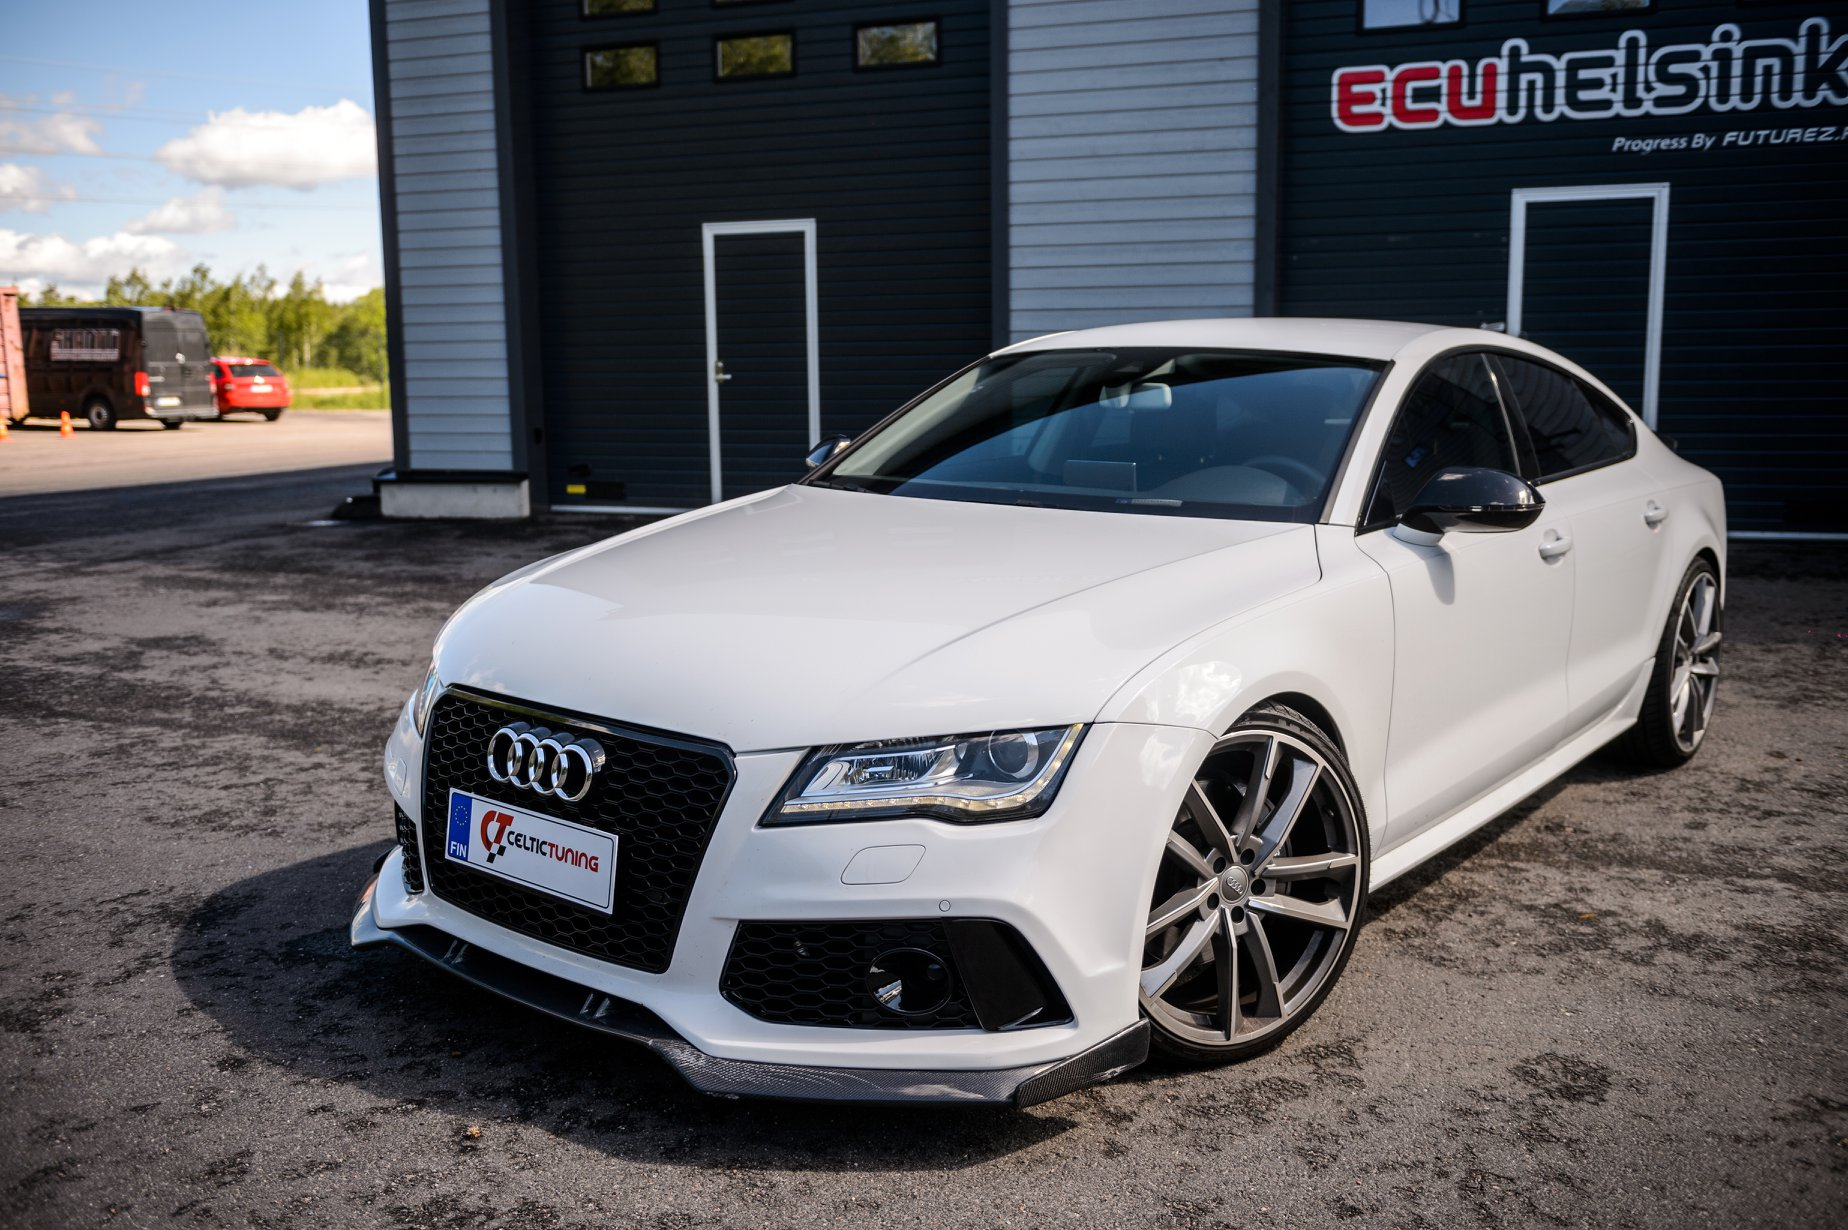 Audi A7 3.0 TFSI celtic tuning lastu